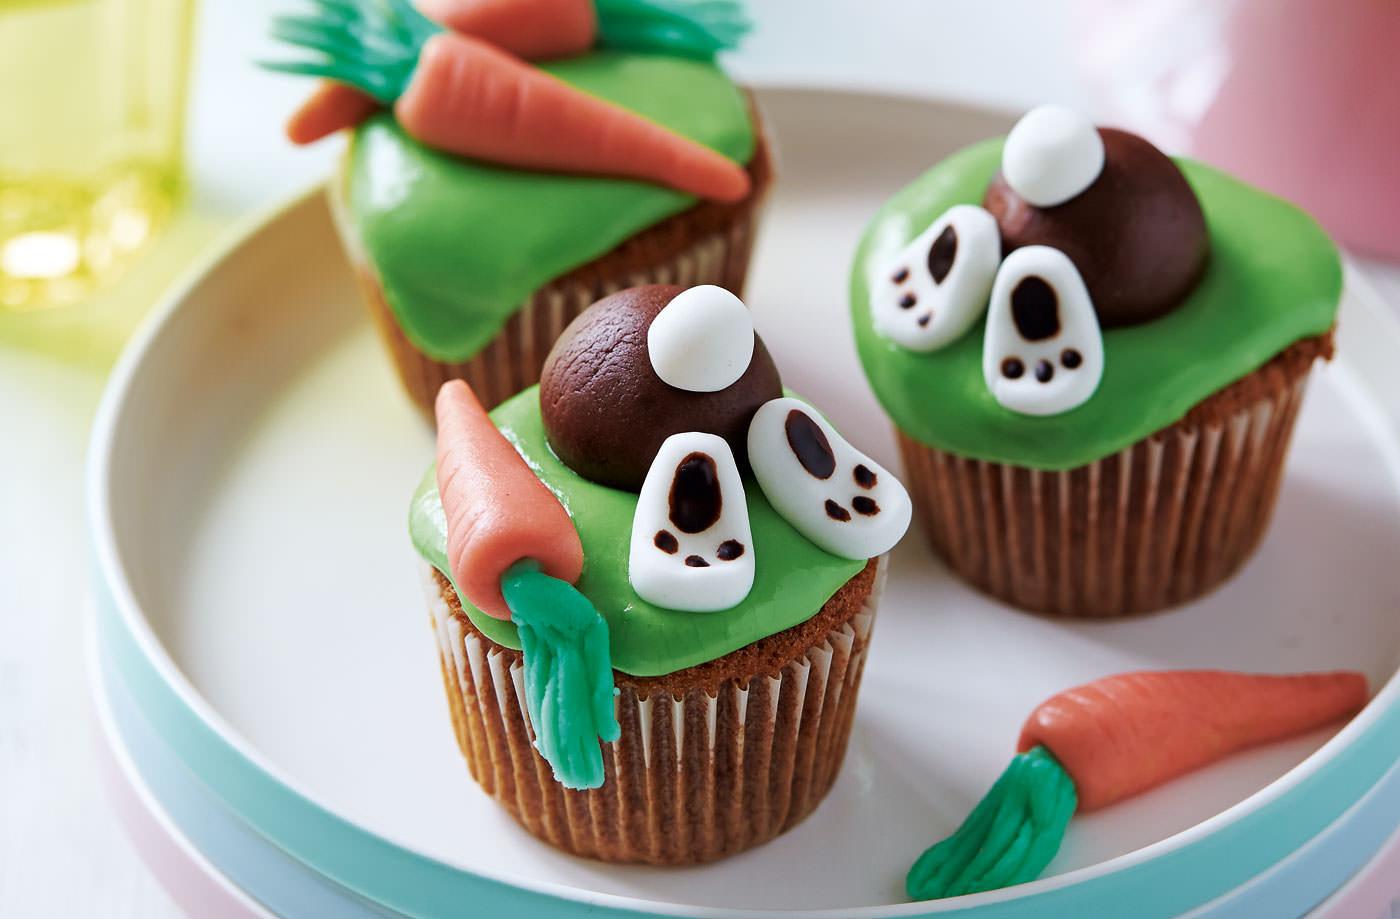 10 Amazing Easter Cupcakes Creative Ideas Gift Ideas